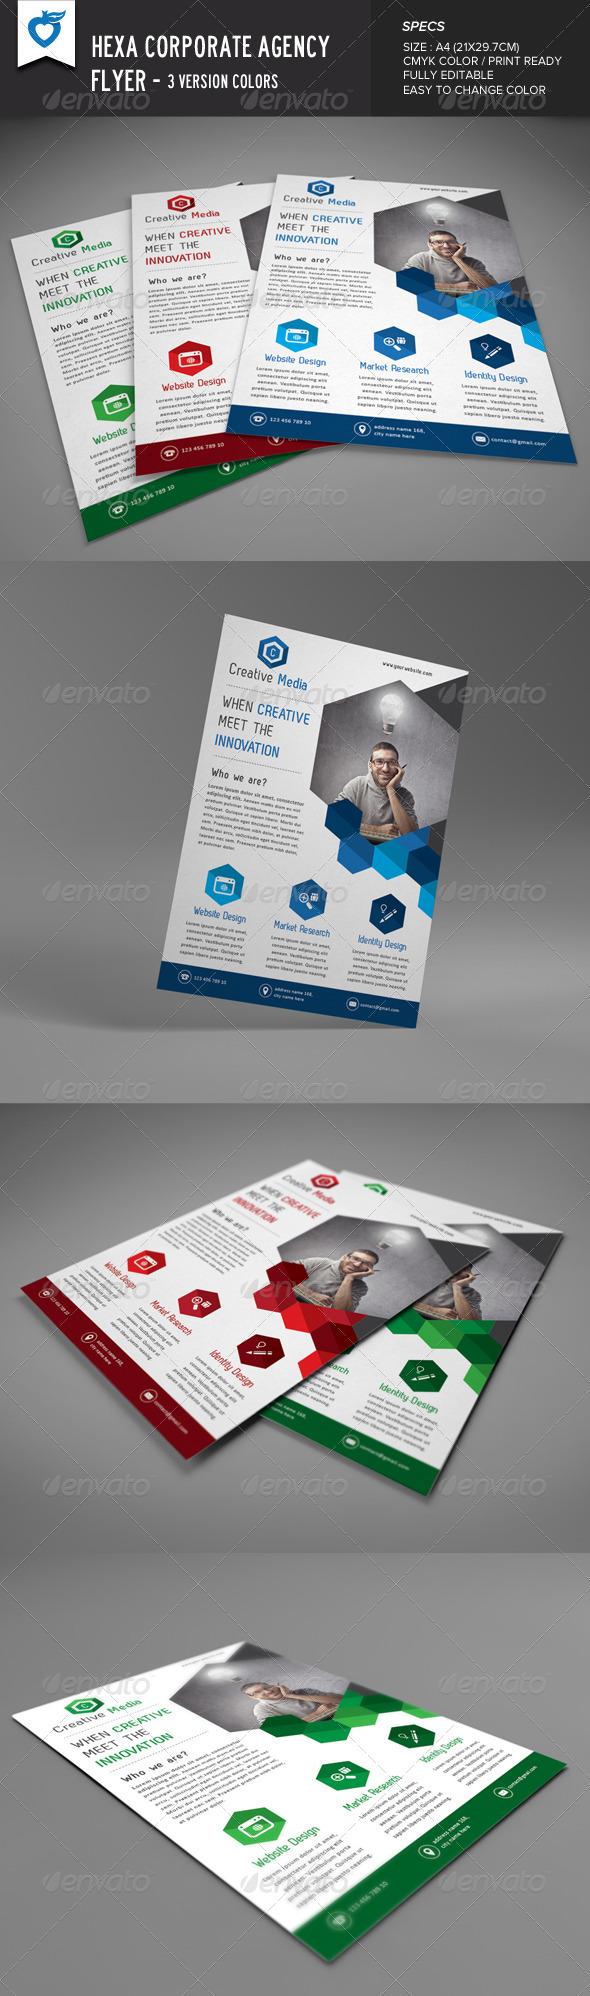 GraphicRiver Hexa Corporate Agency Flyer 8712550